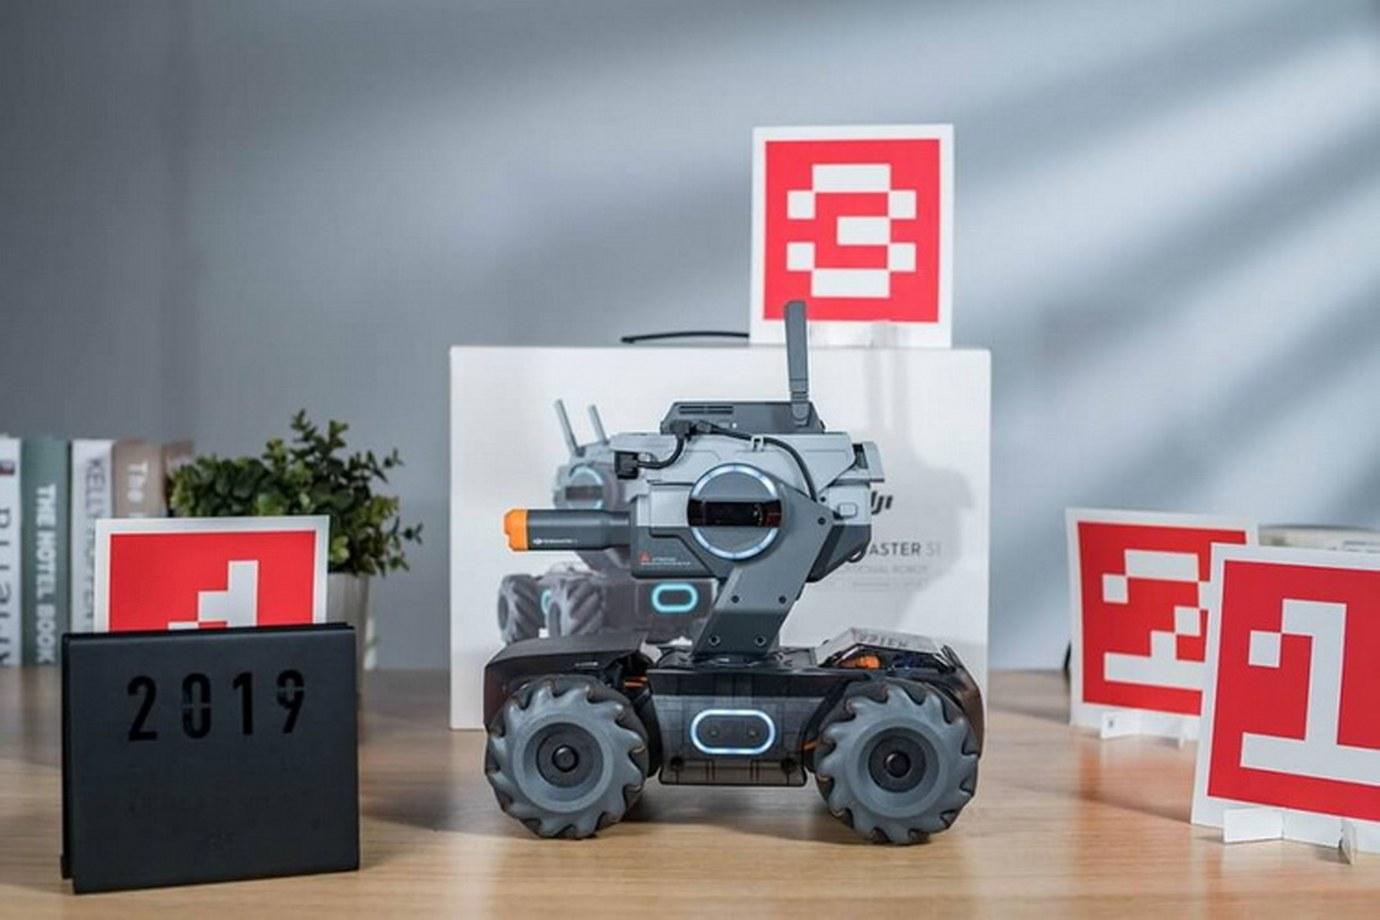 The Robomaster S1